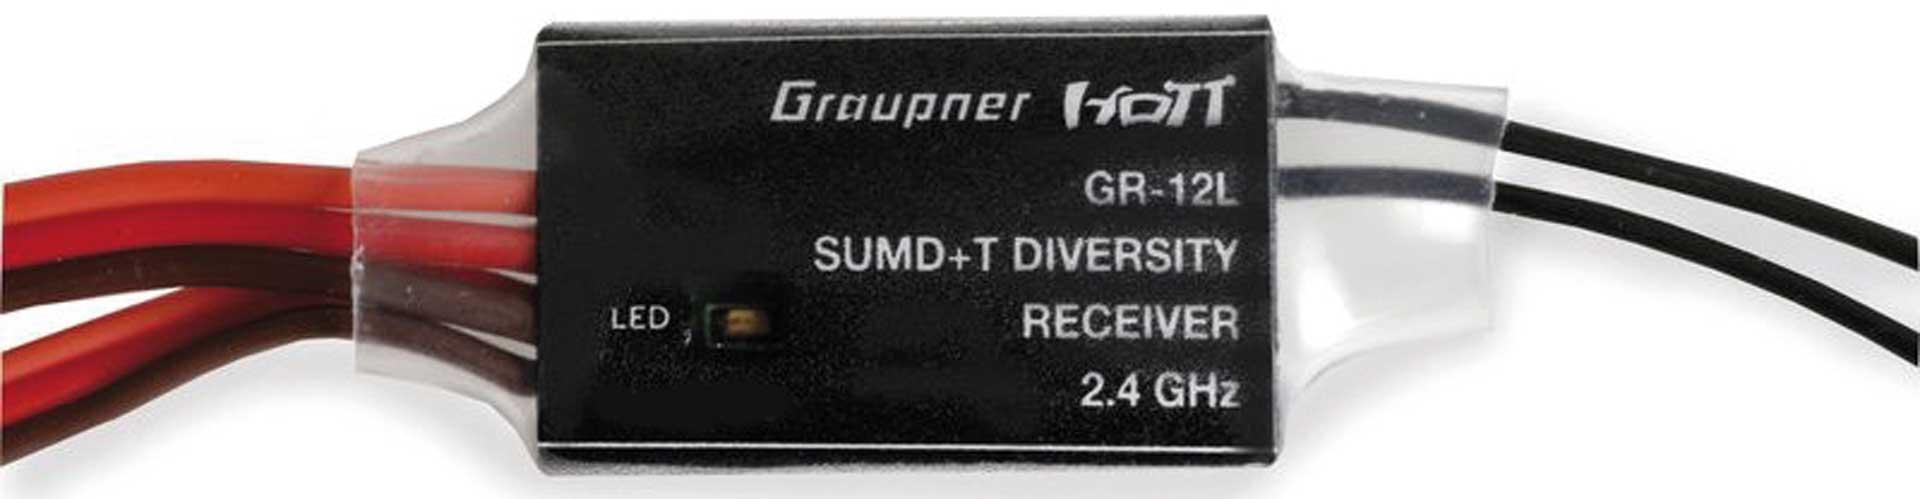 GRAUPNER GR-12L SUMD+T 2 Antennen 2.4 GHz Empfänger